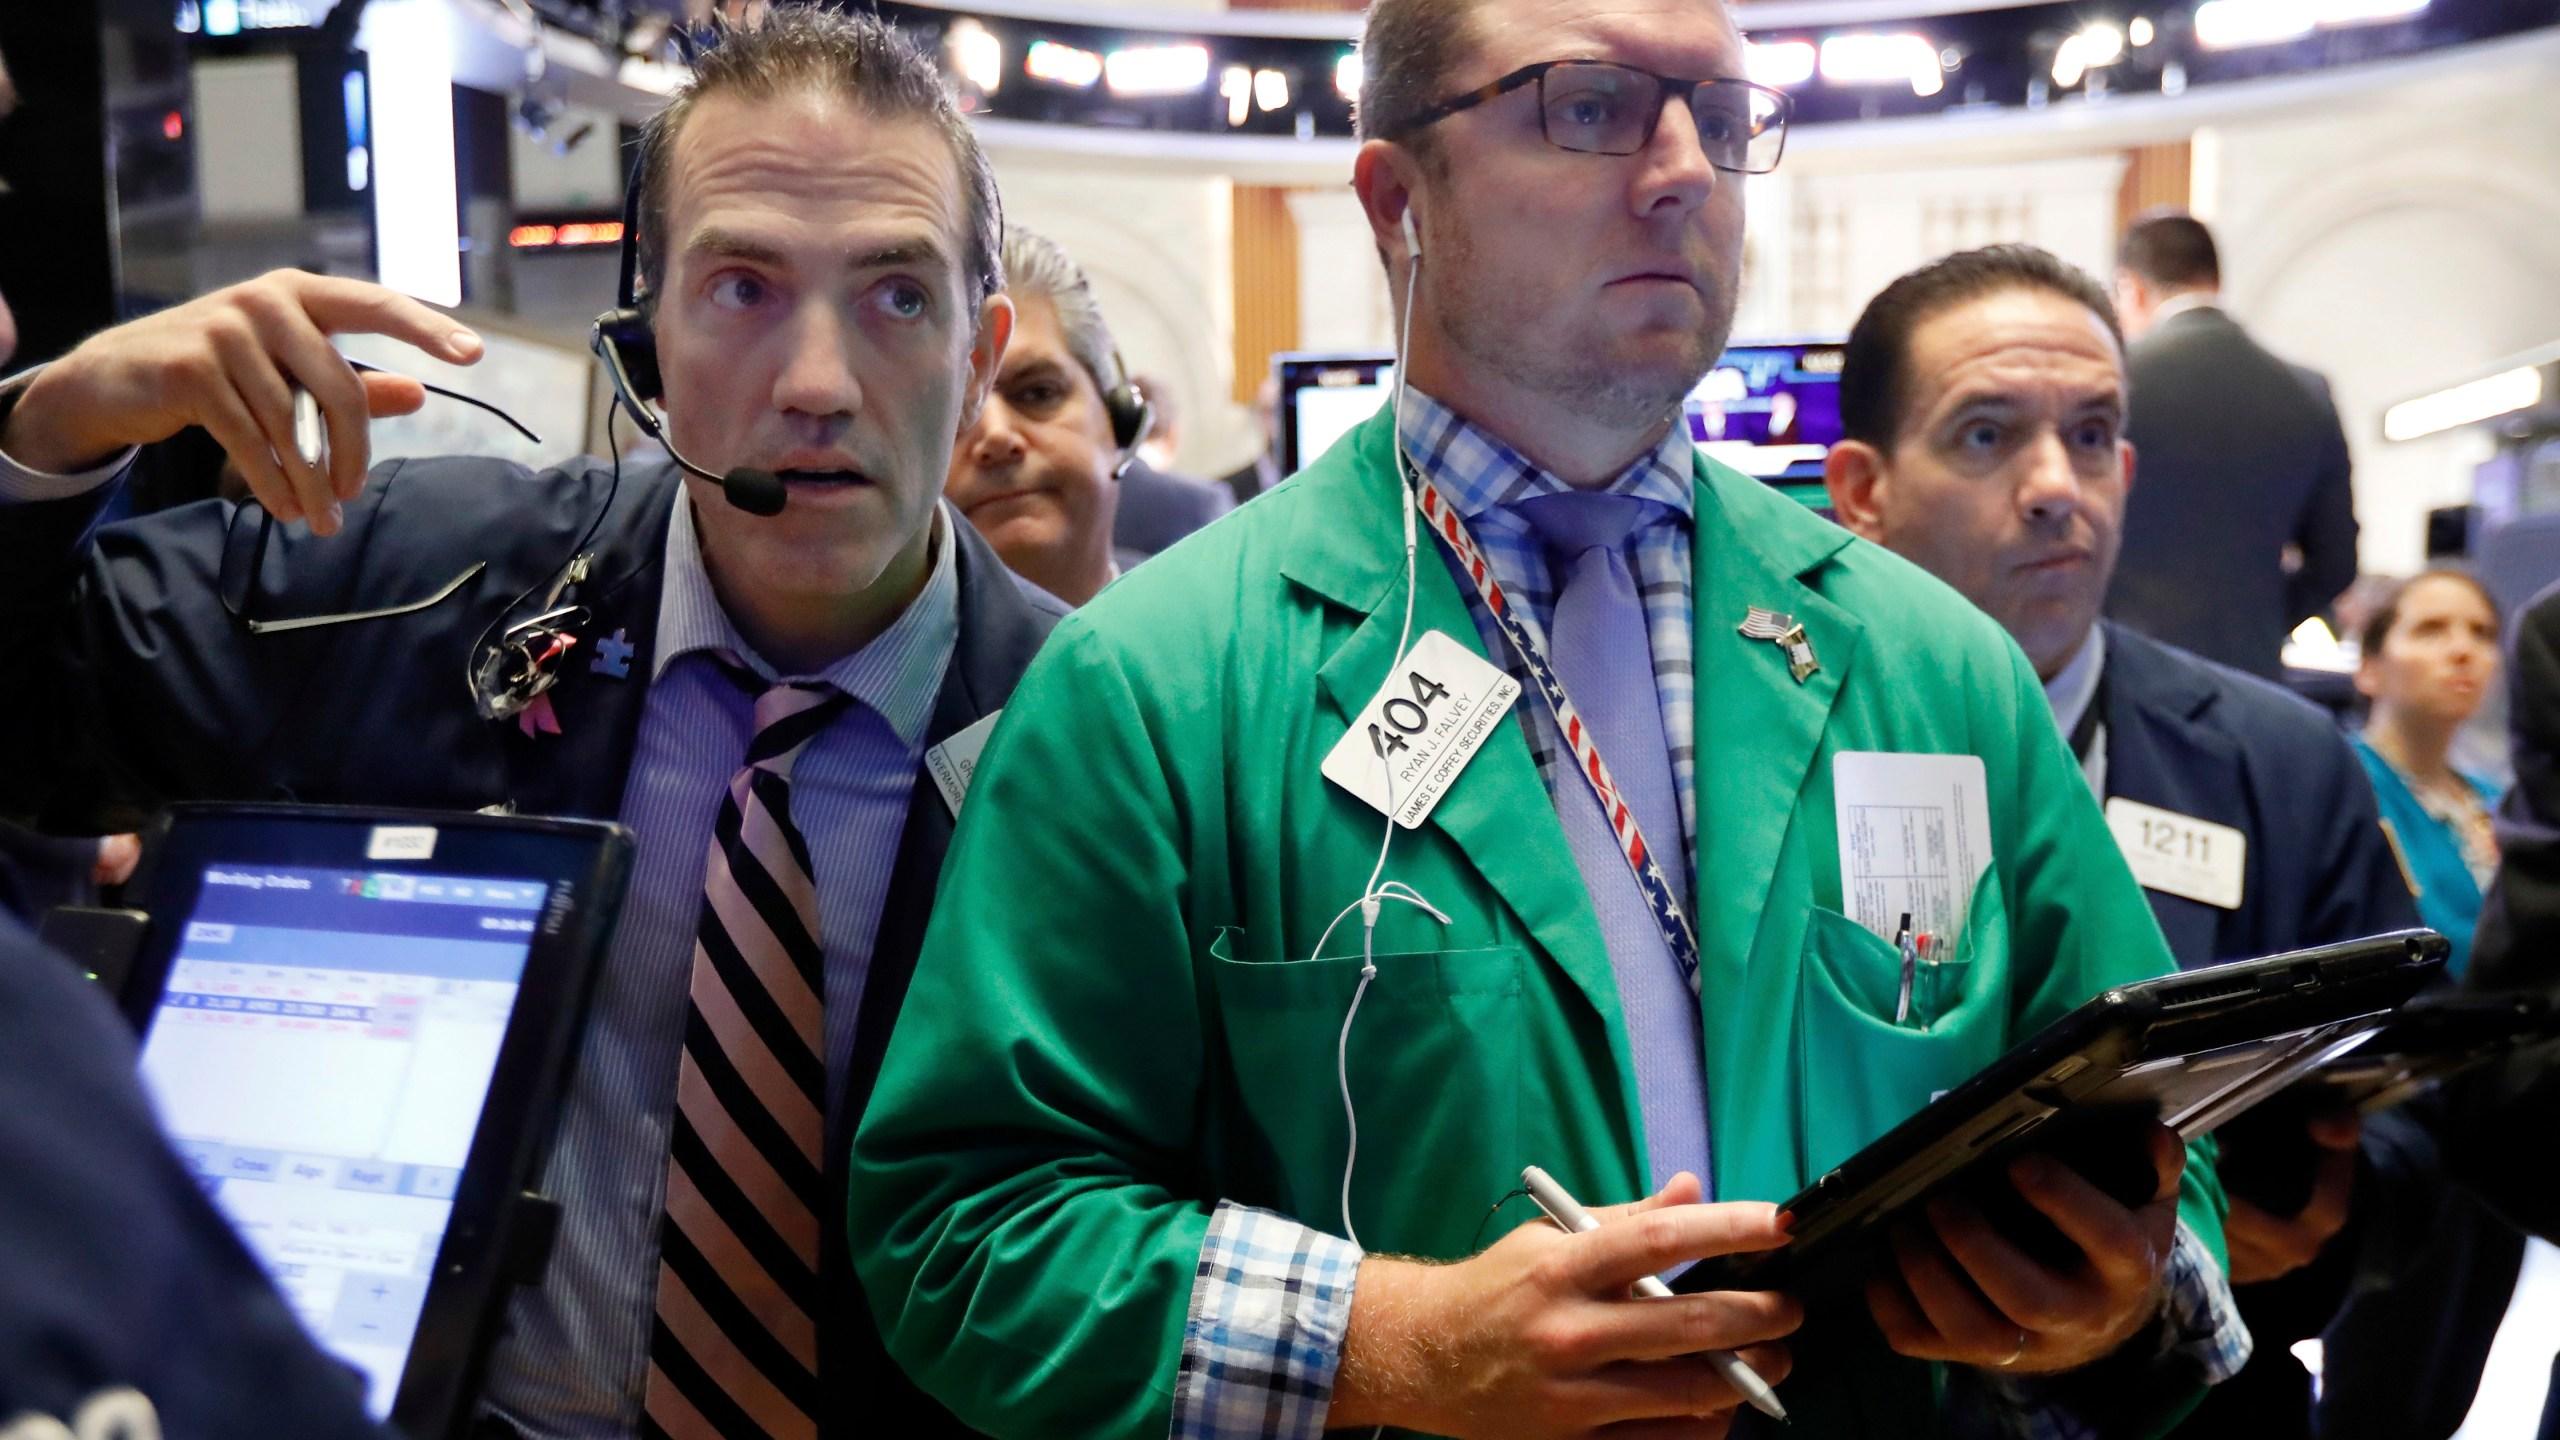 Financial_Markets_Wall_Street_45500-159532.jpg25018158